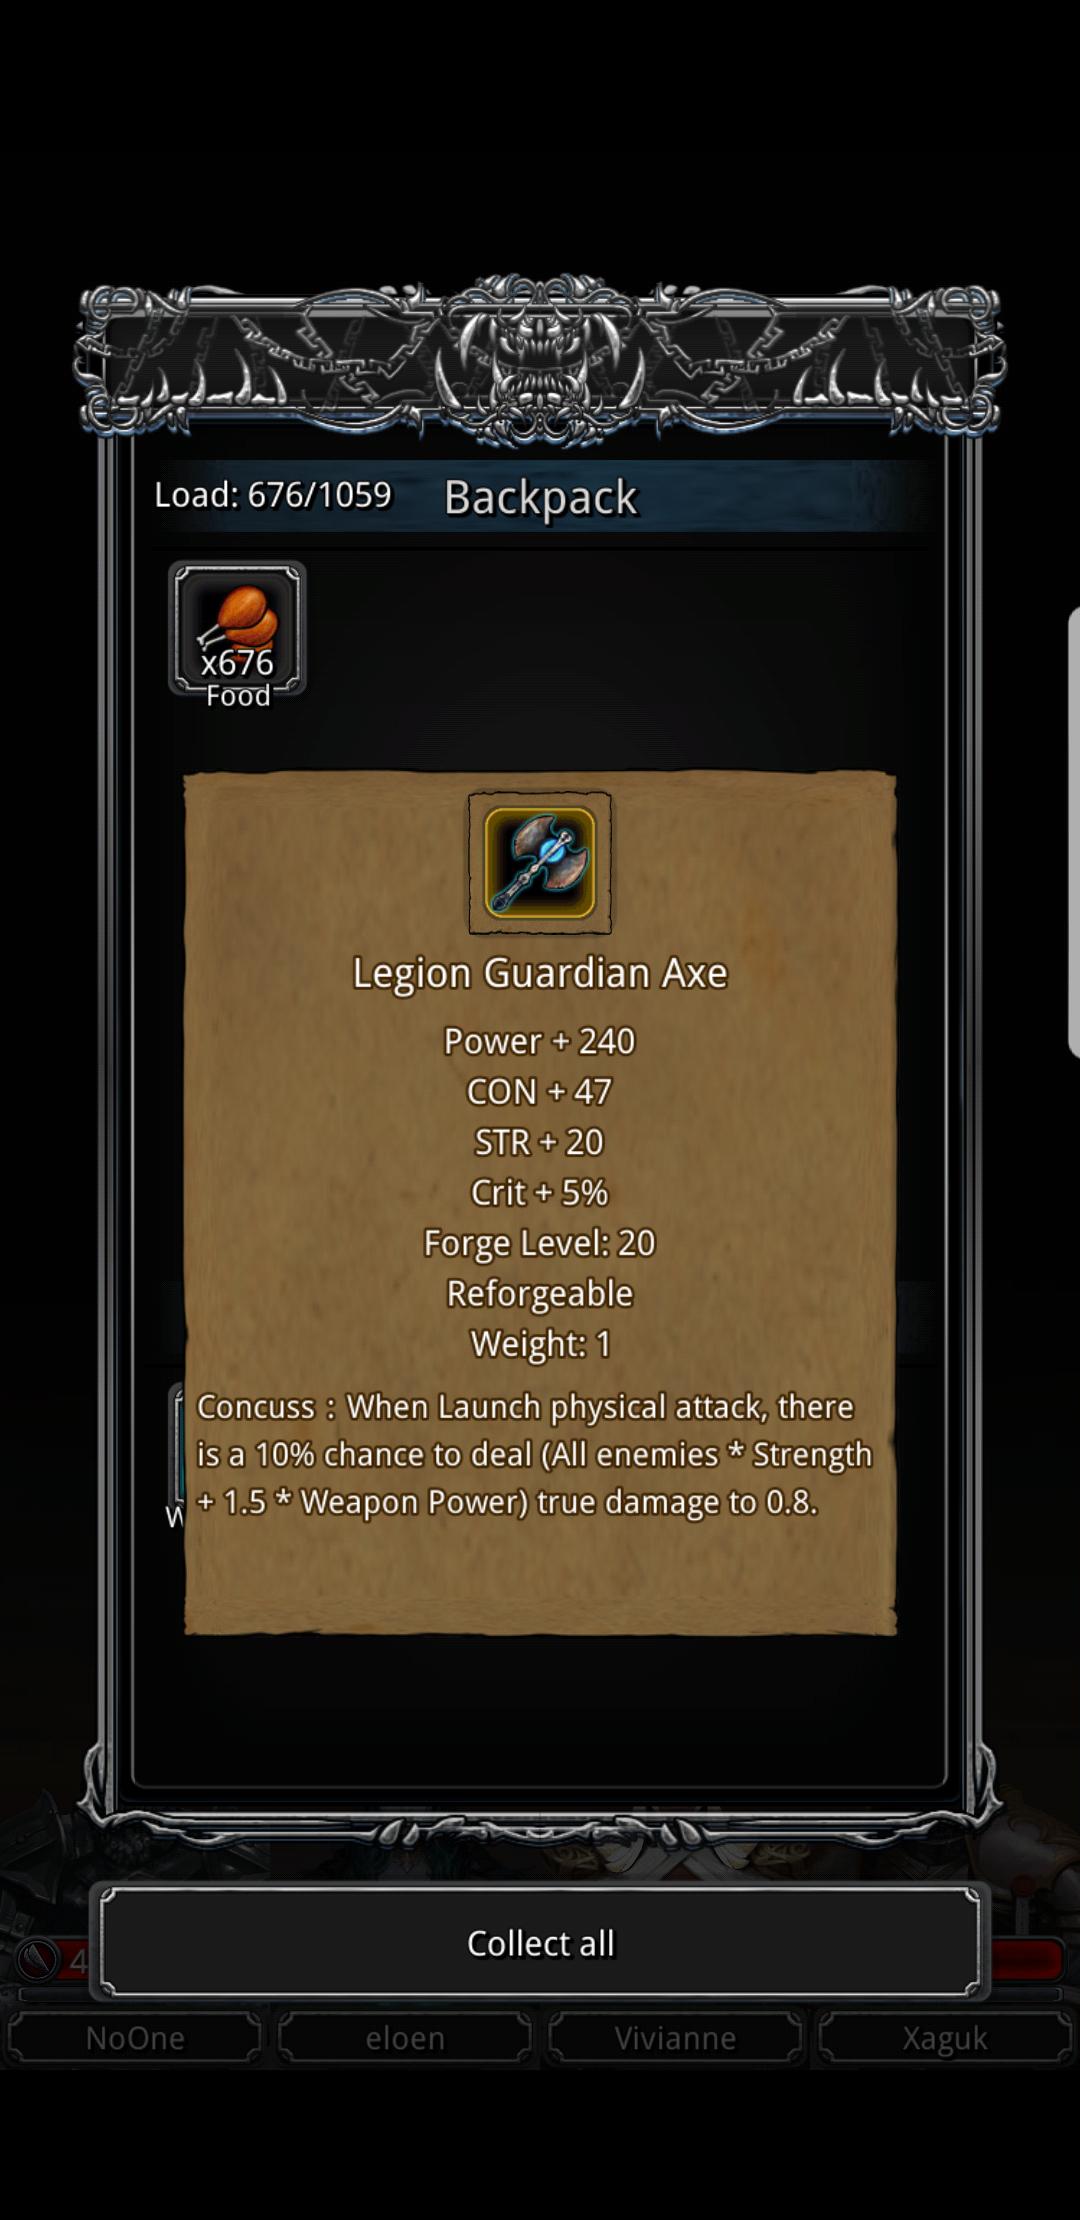 Image Screenshot 20180301 085814png Dungeon Survivor Ii Wiki